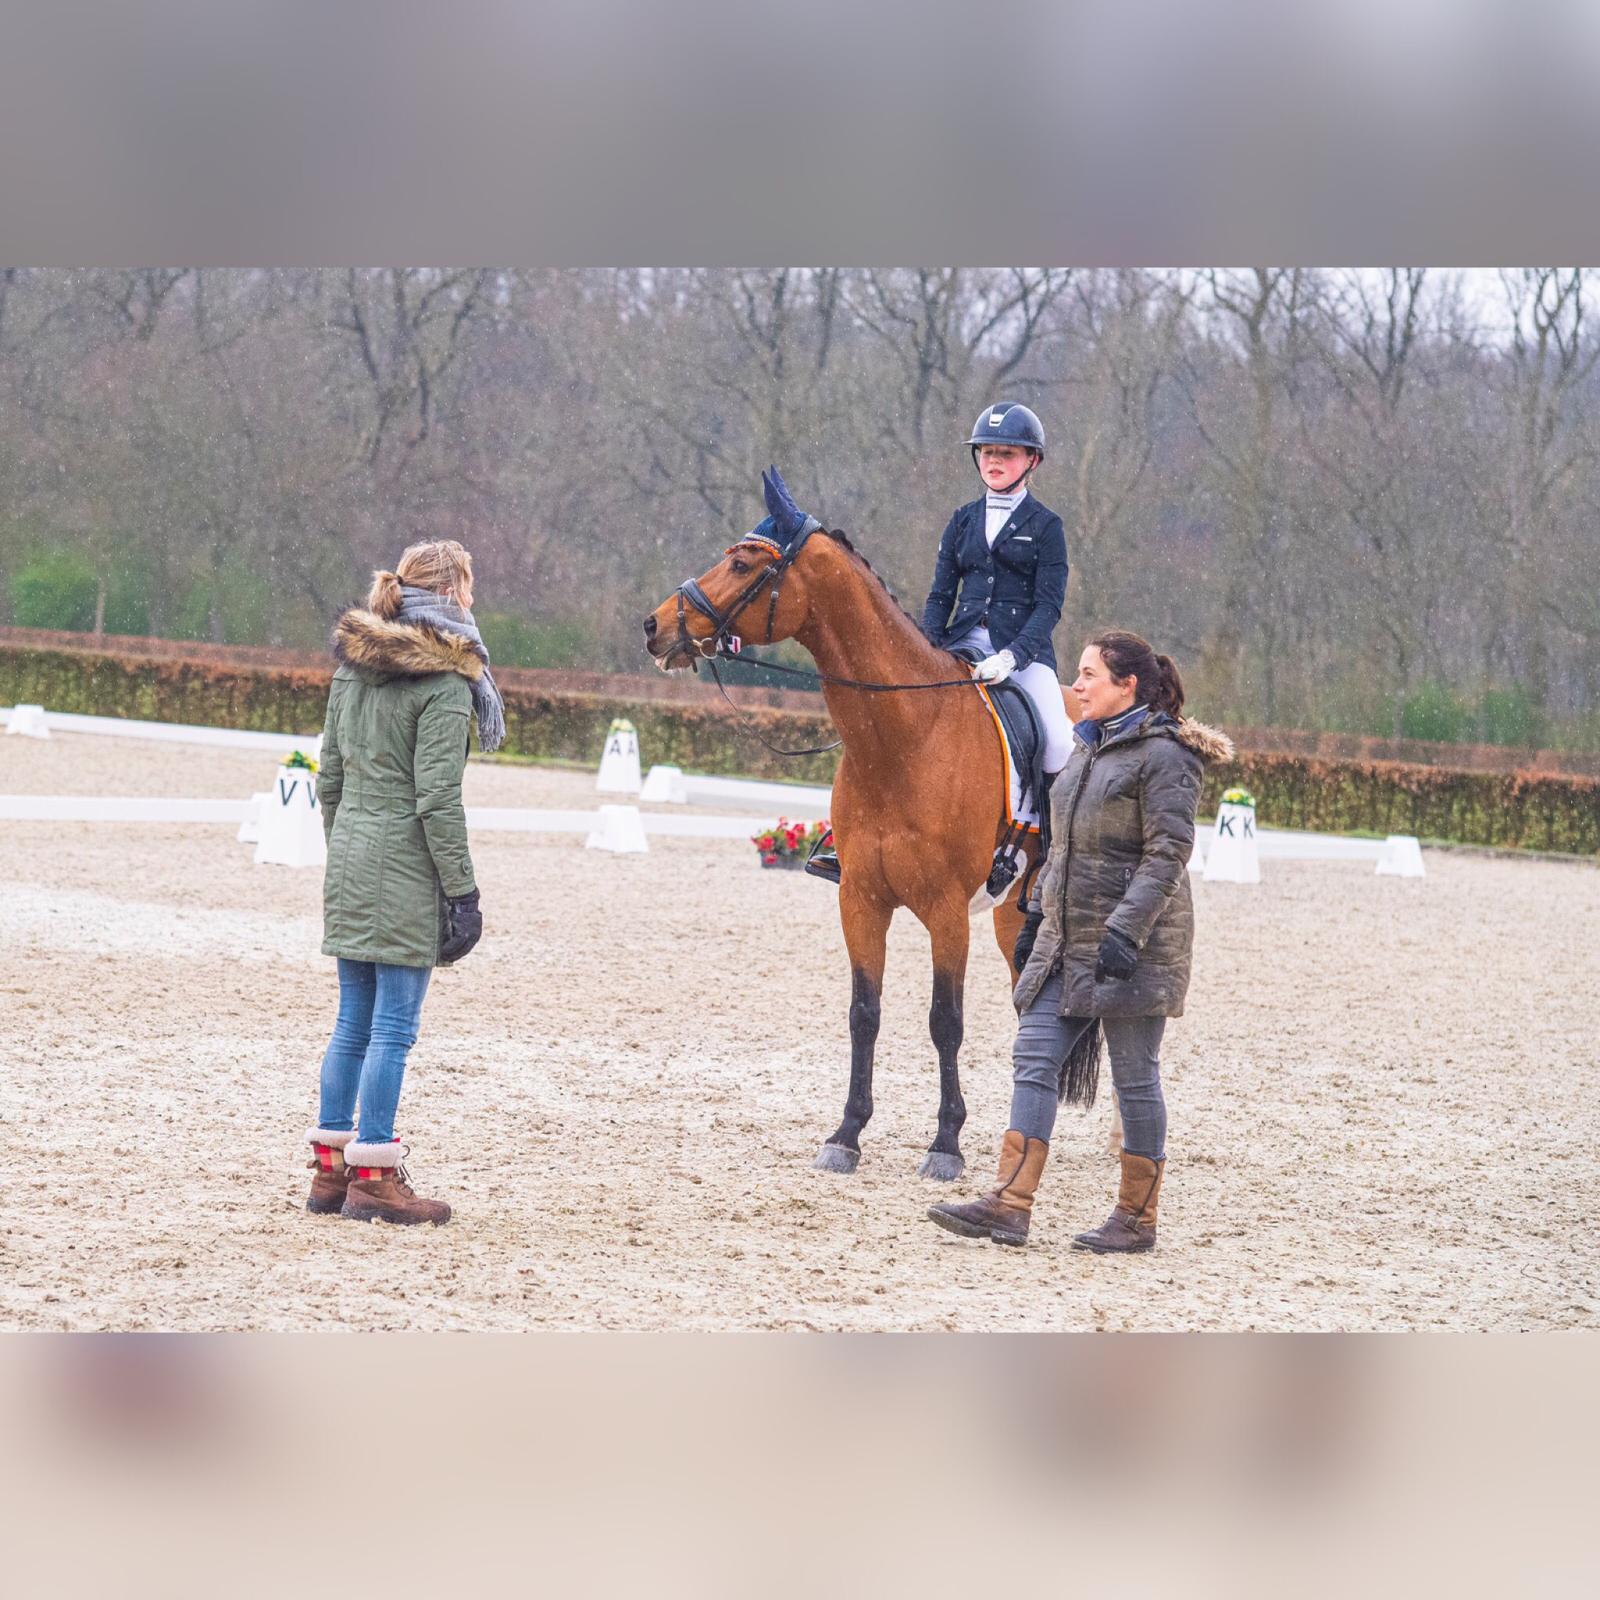 KNHS scouting dag met Imke Schellekens-Bartels